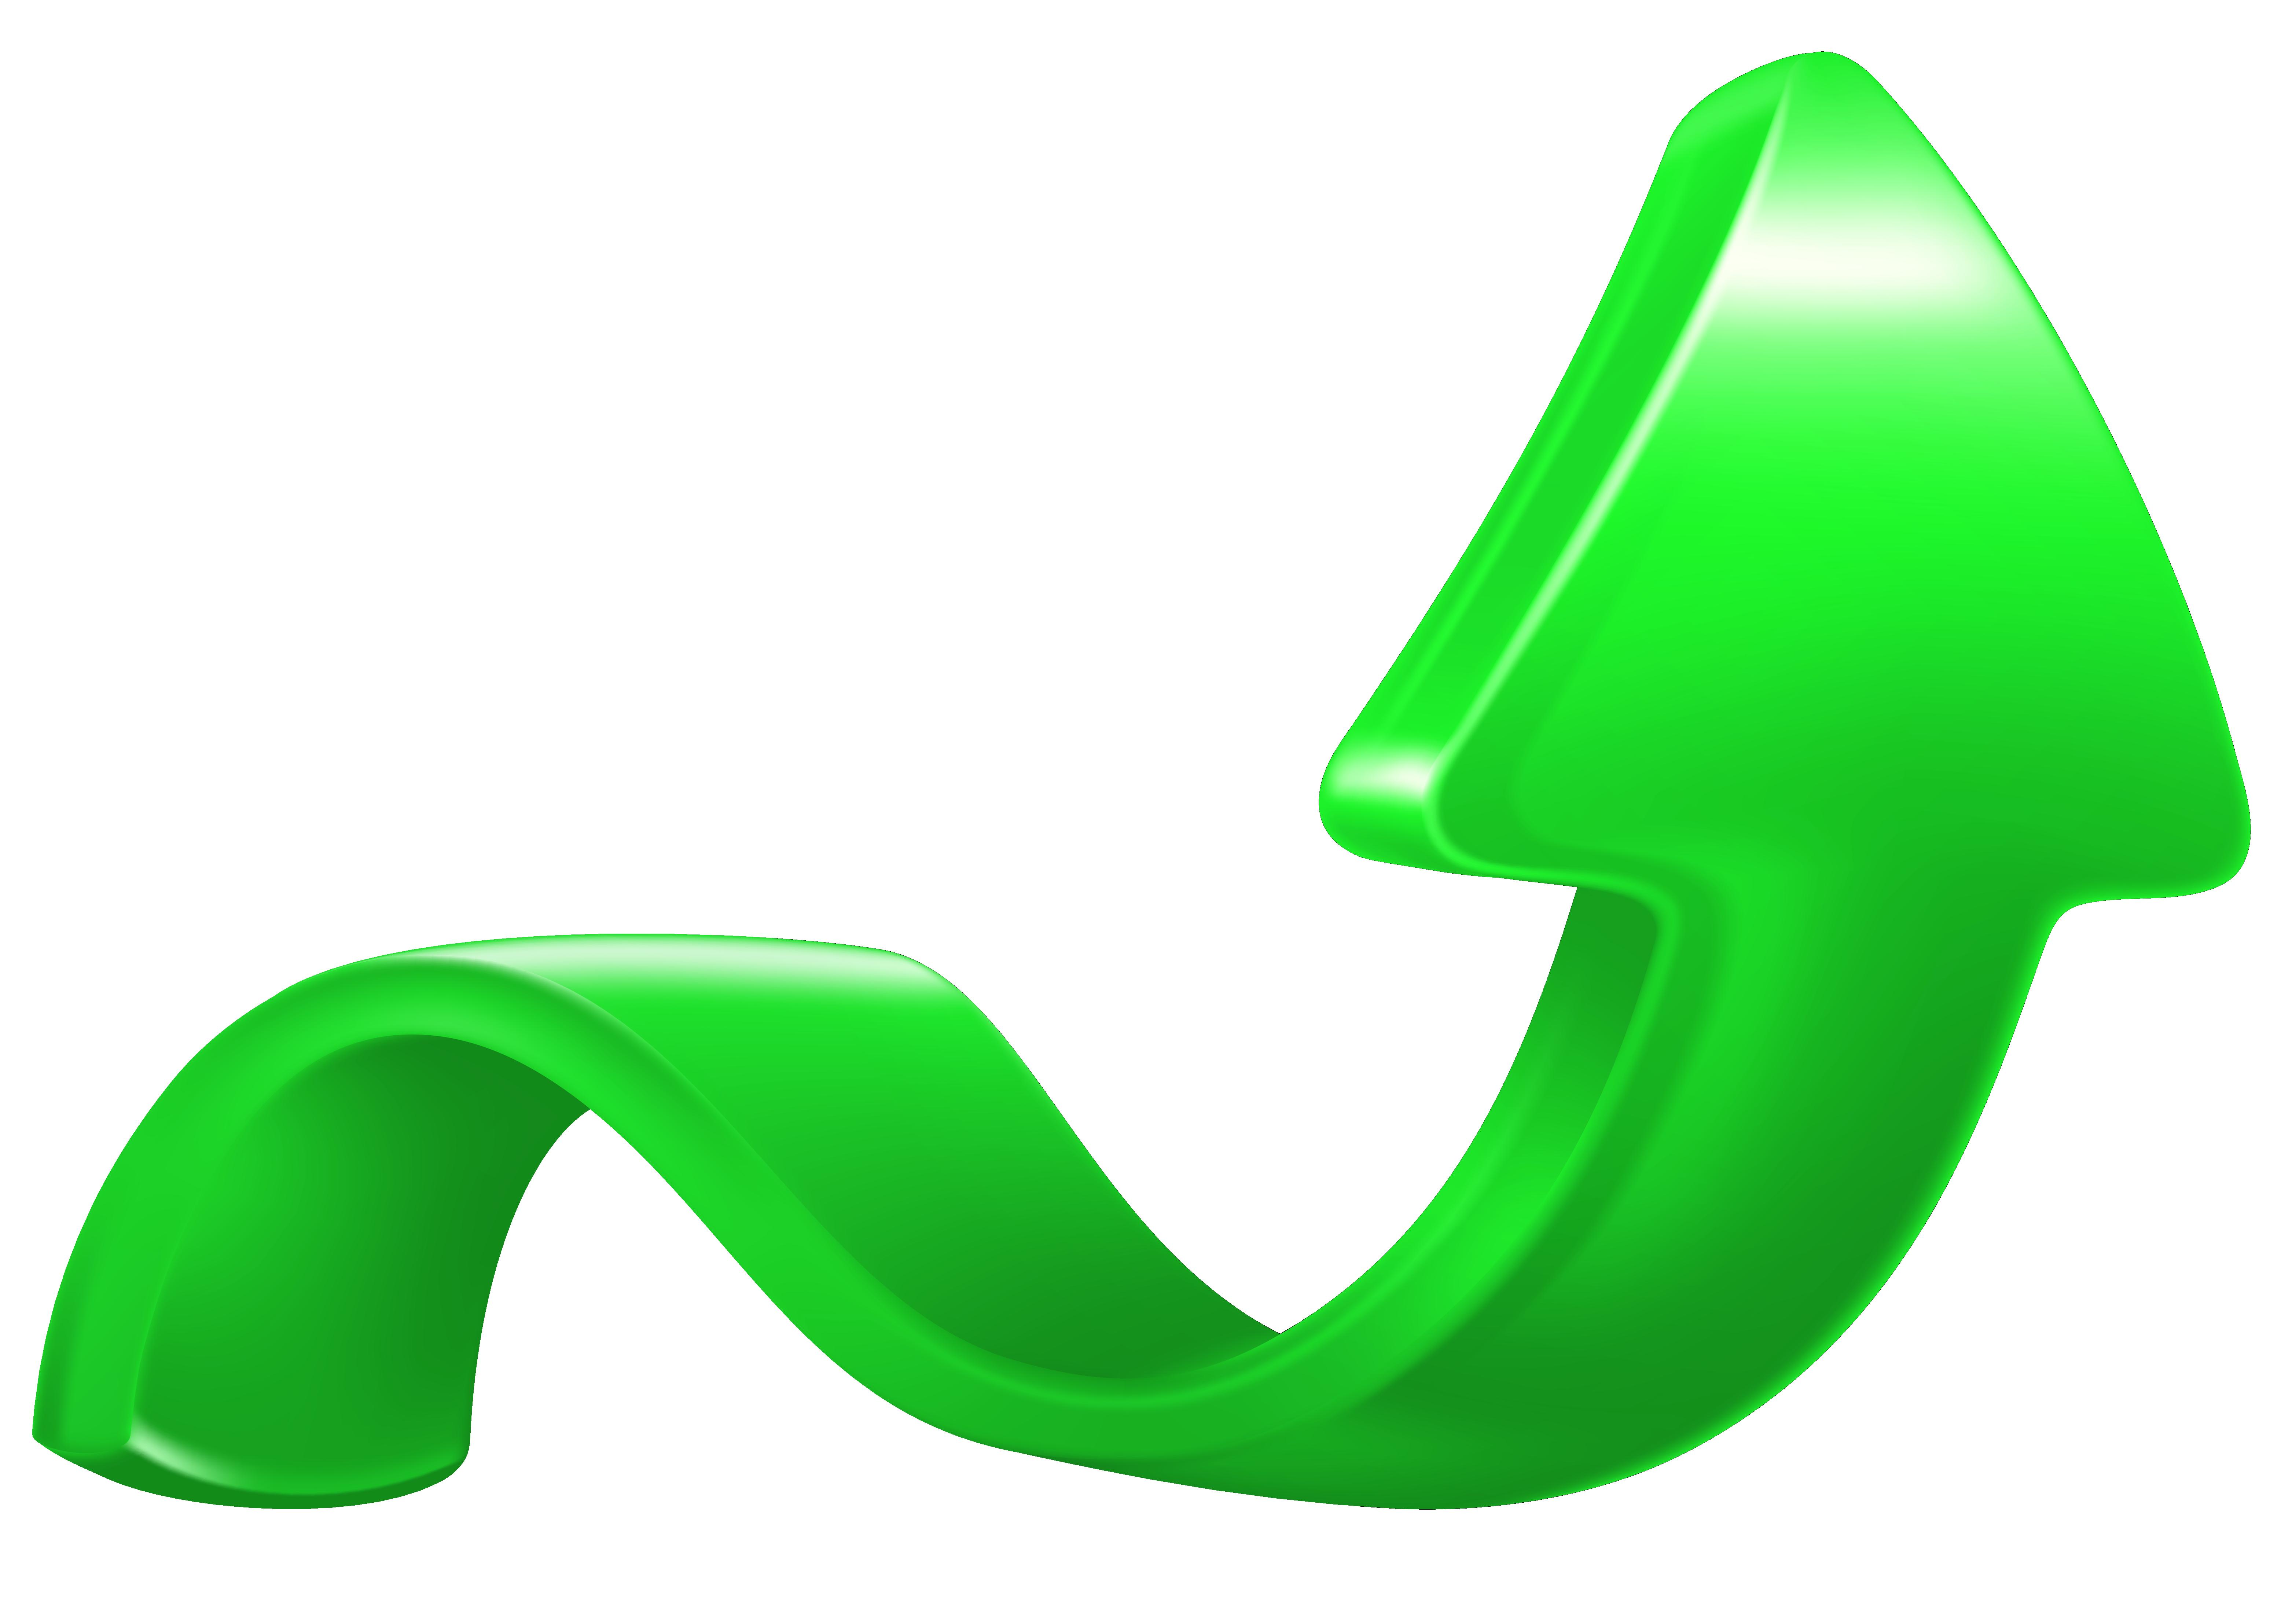 Increase arrow green png. Clipart arrows future